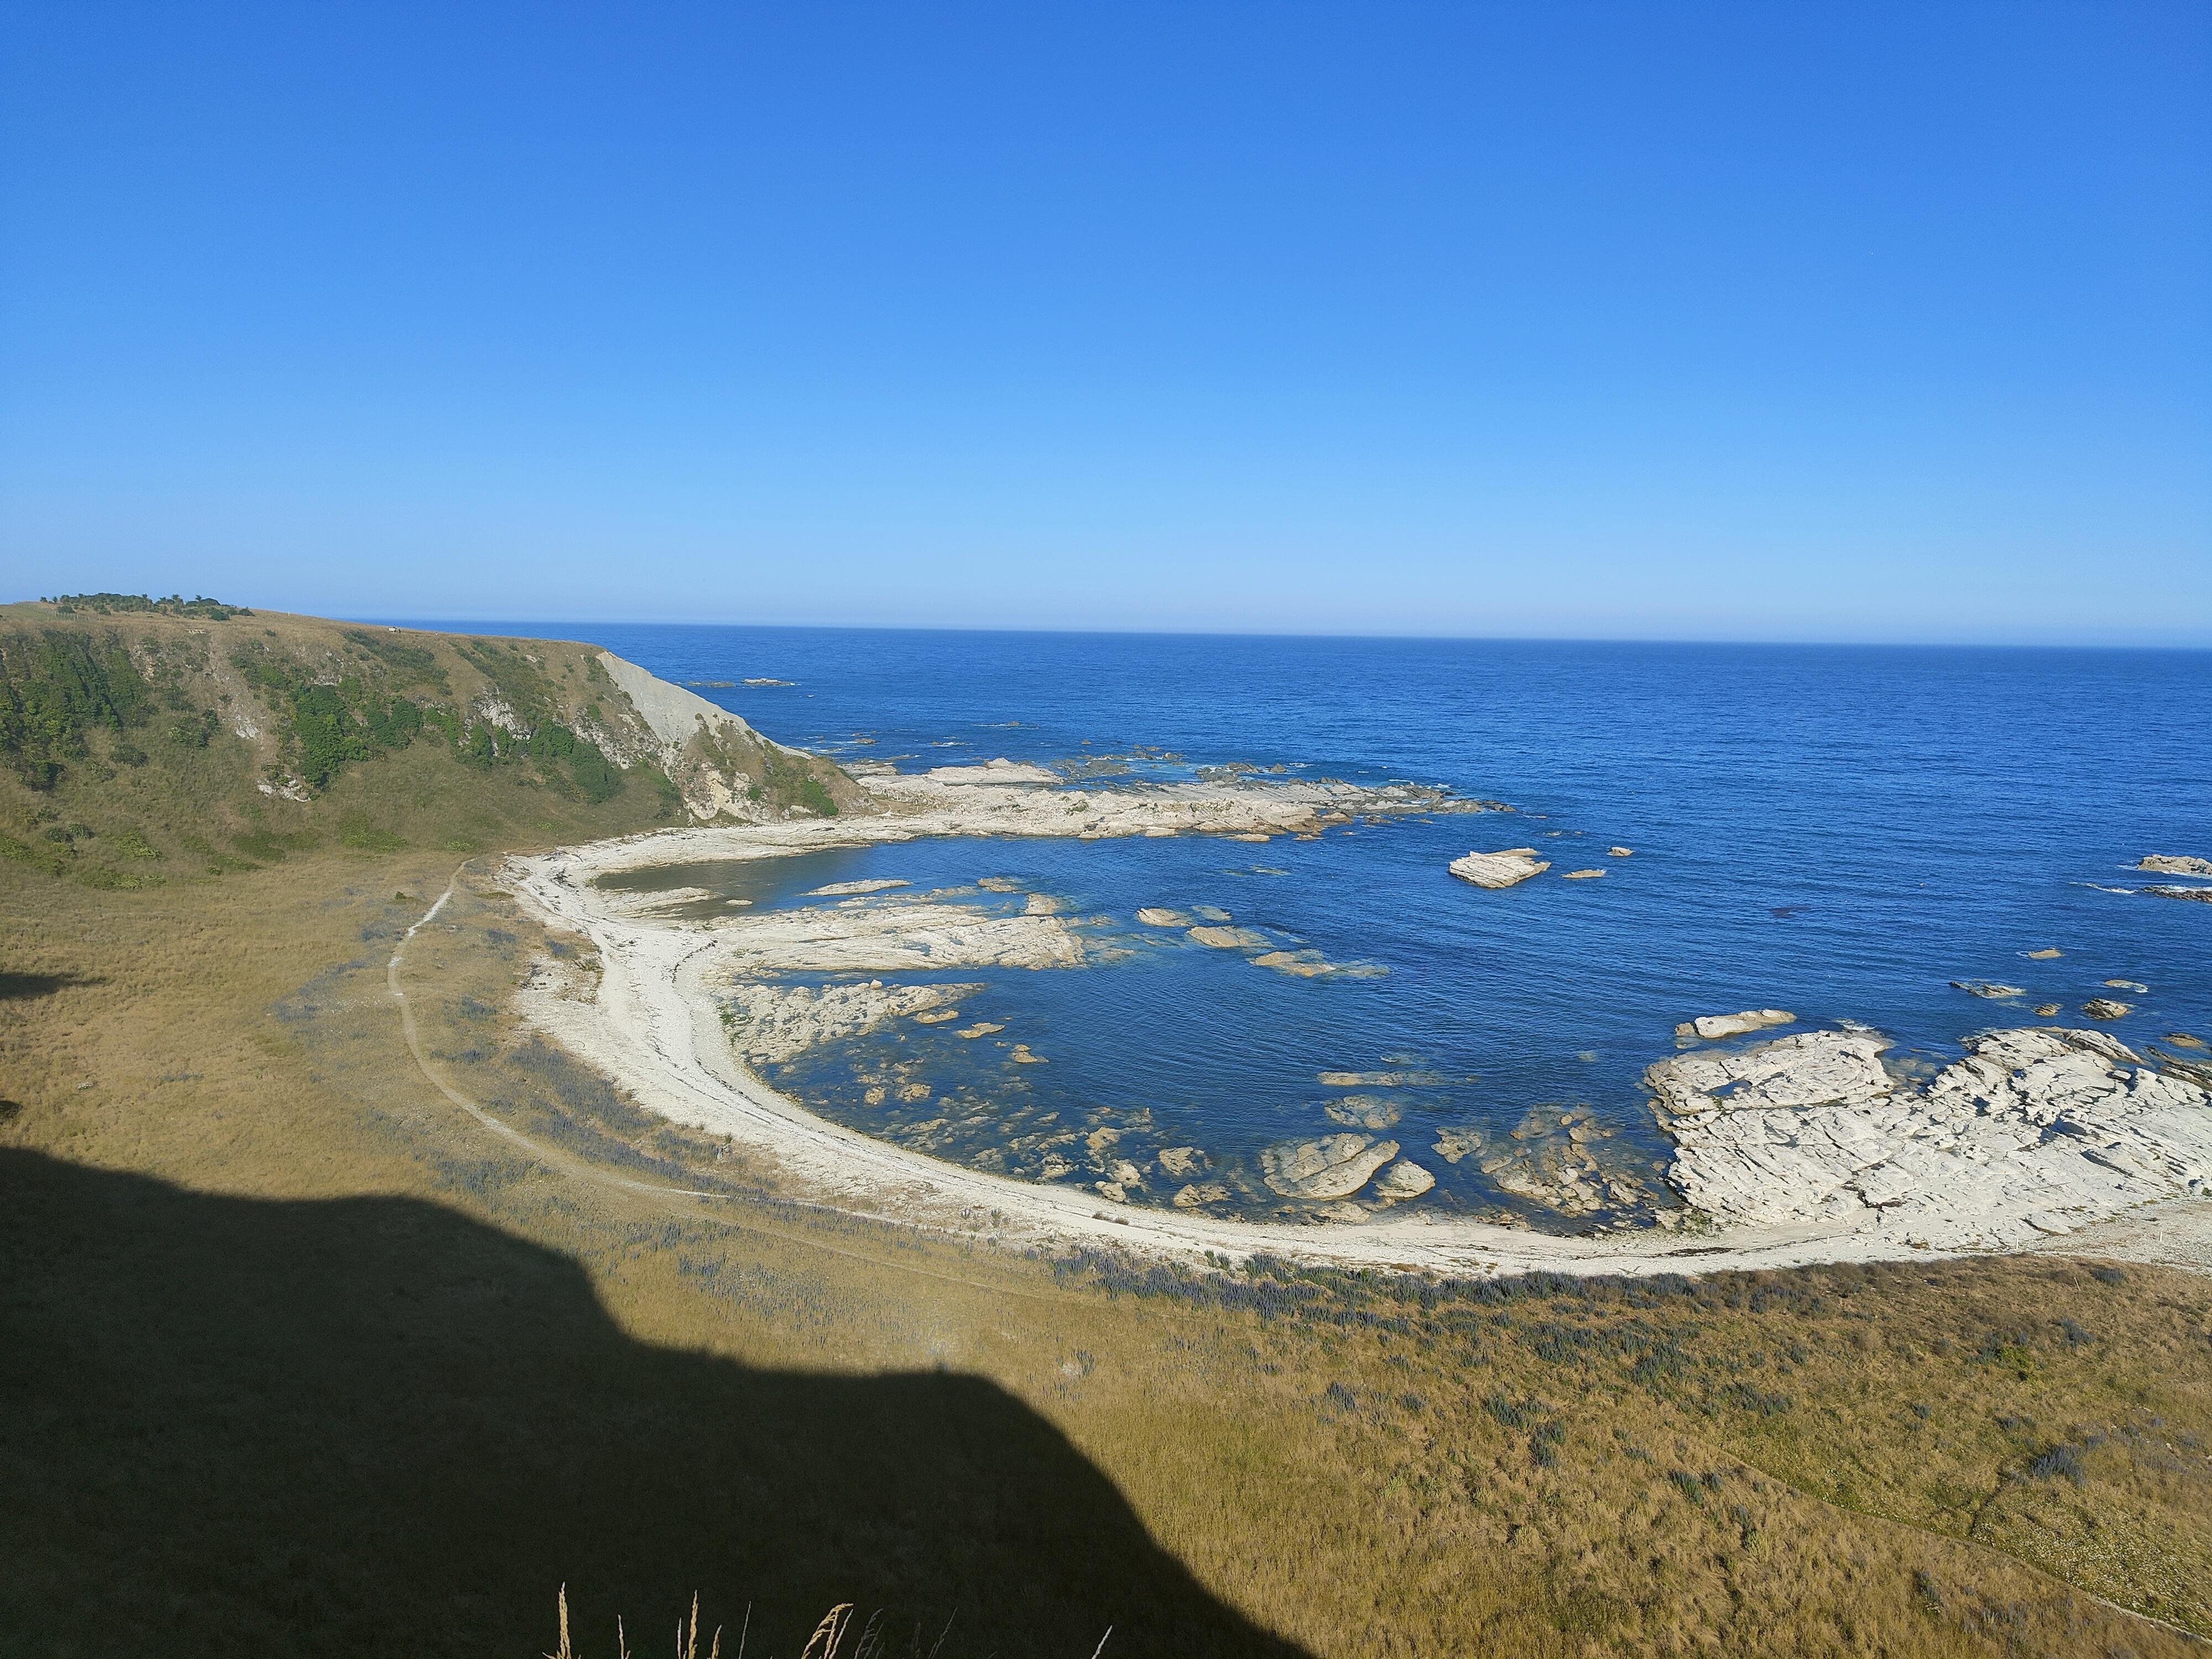 Looking down from the Kaikoura Peninsula Walkway